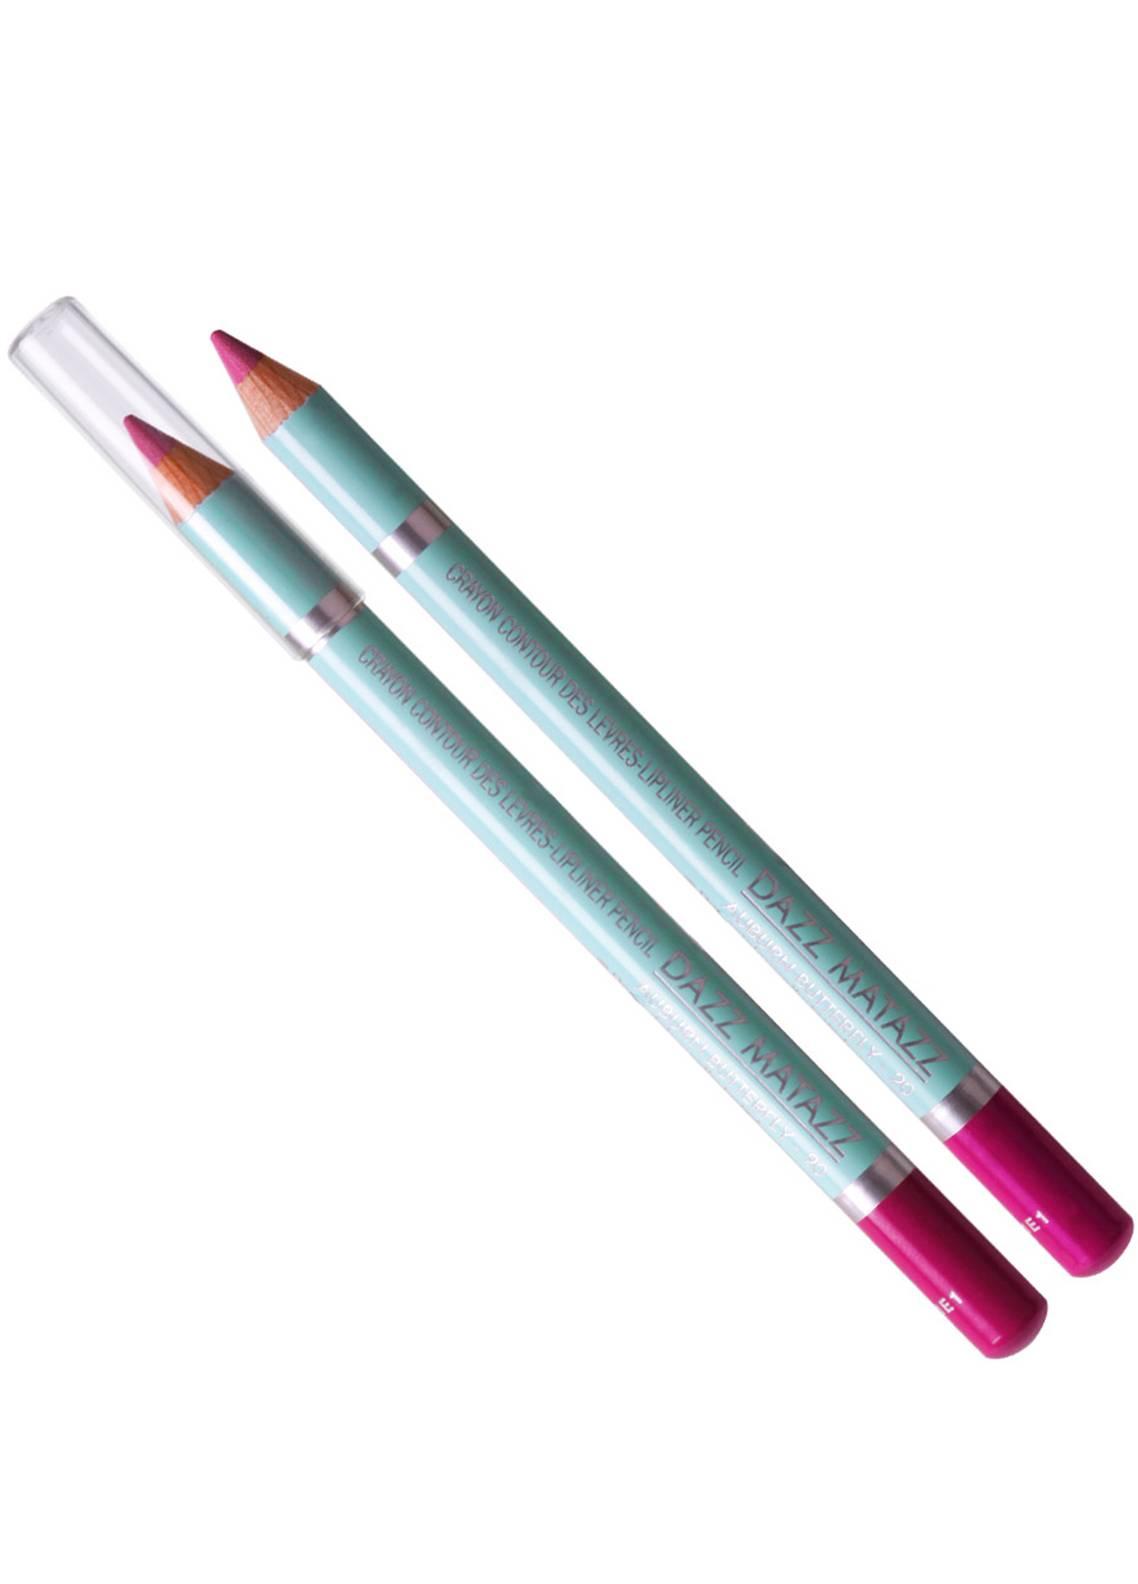 Dazz Matazz Lip Liner Pencil-20 AUBURN BUTTEFLY